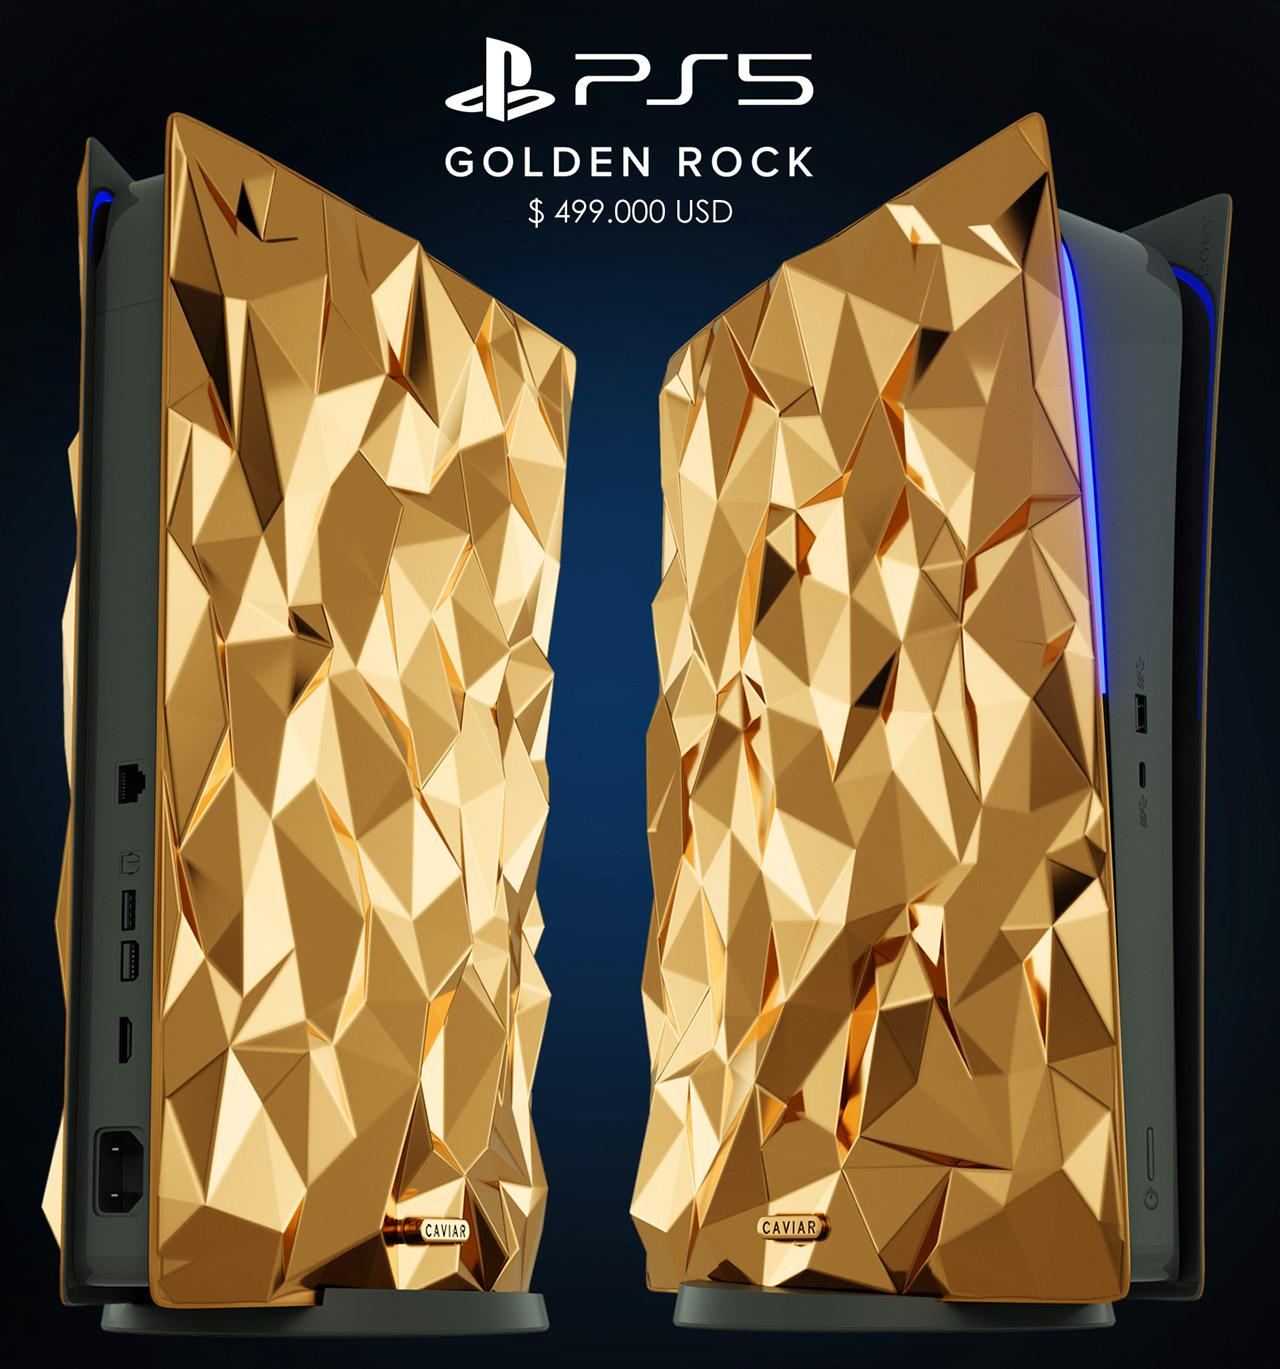 Caviar PlayStation 5 Golden Rock Edition